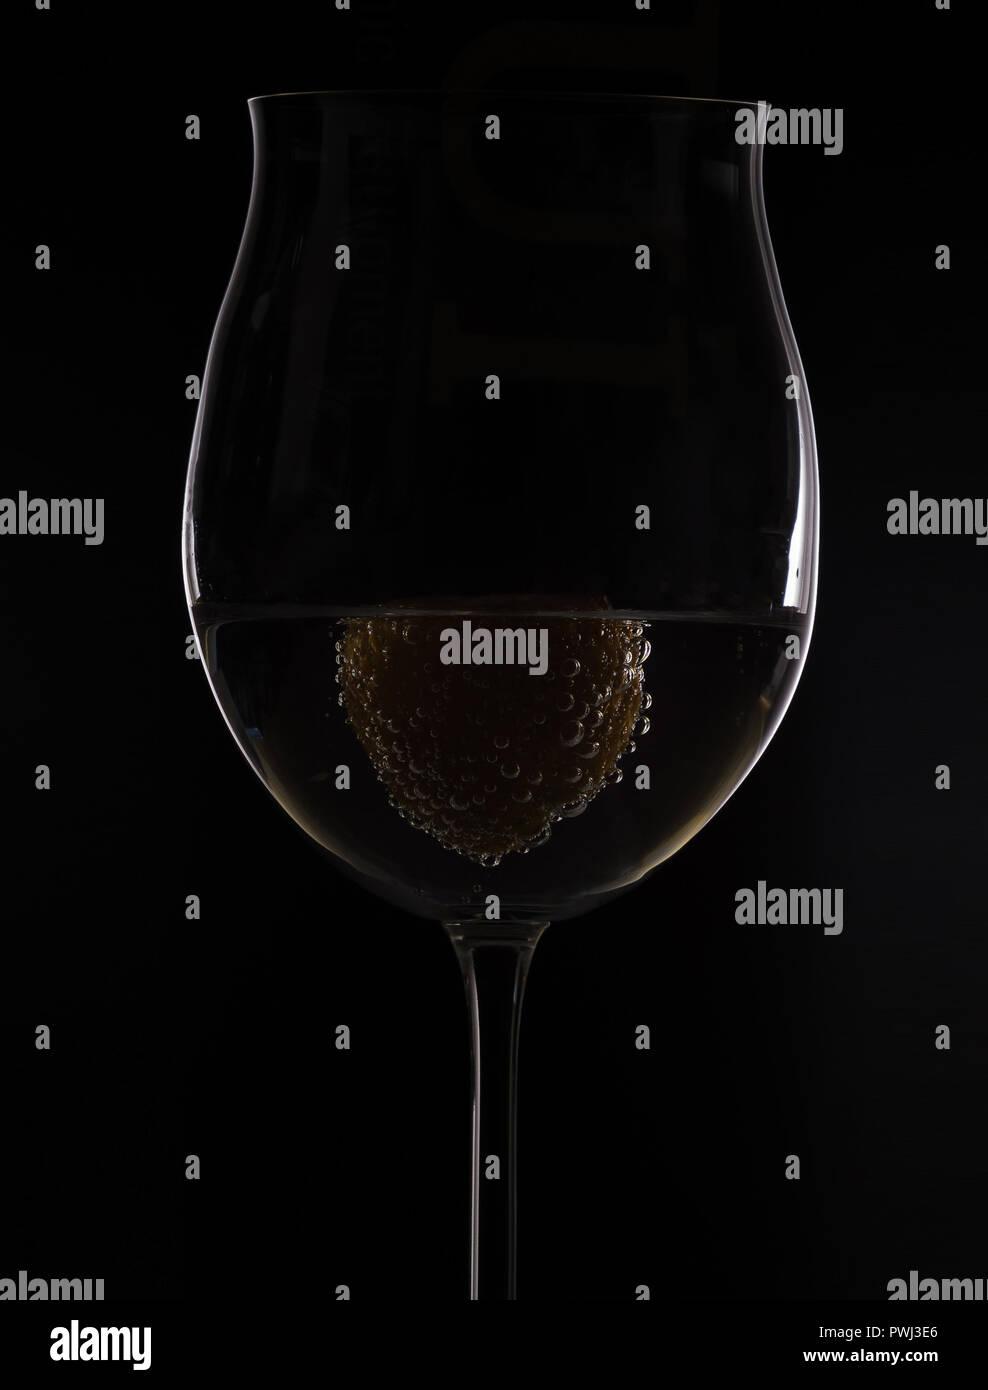 Weinglas Silhouette - Stock Image